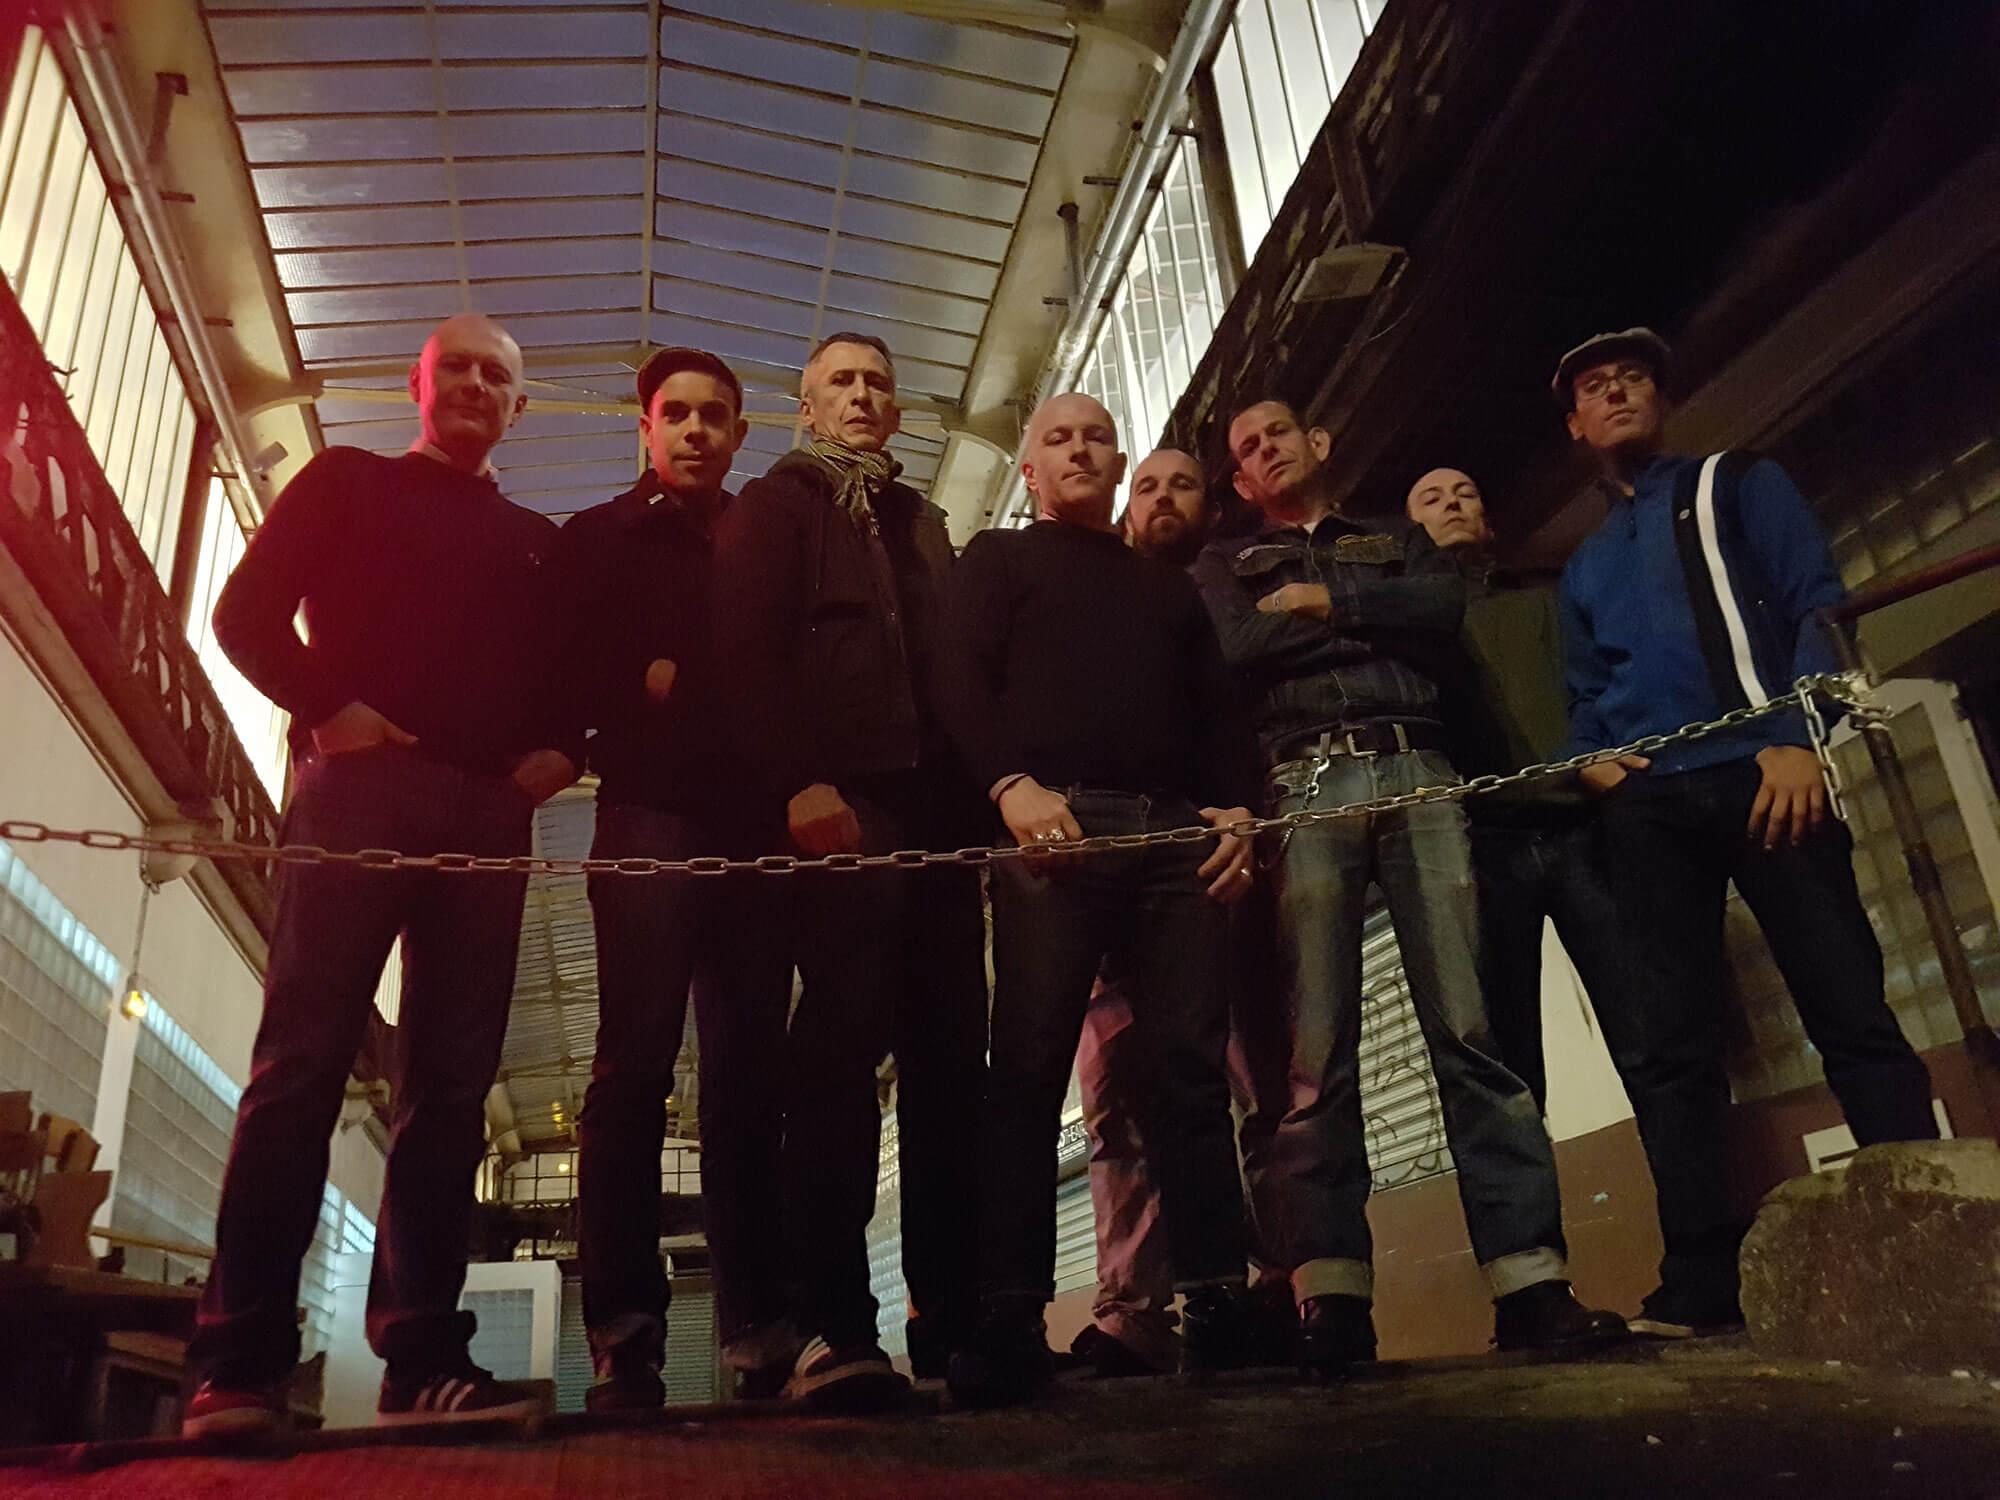 Photo du groupe 8°6 Crew